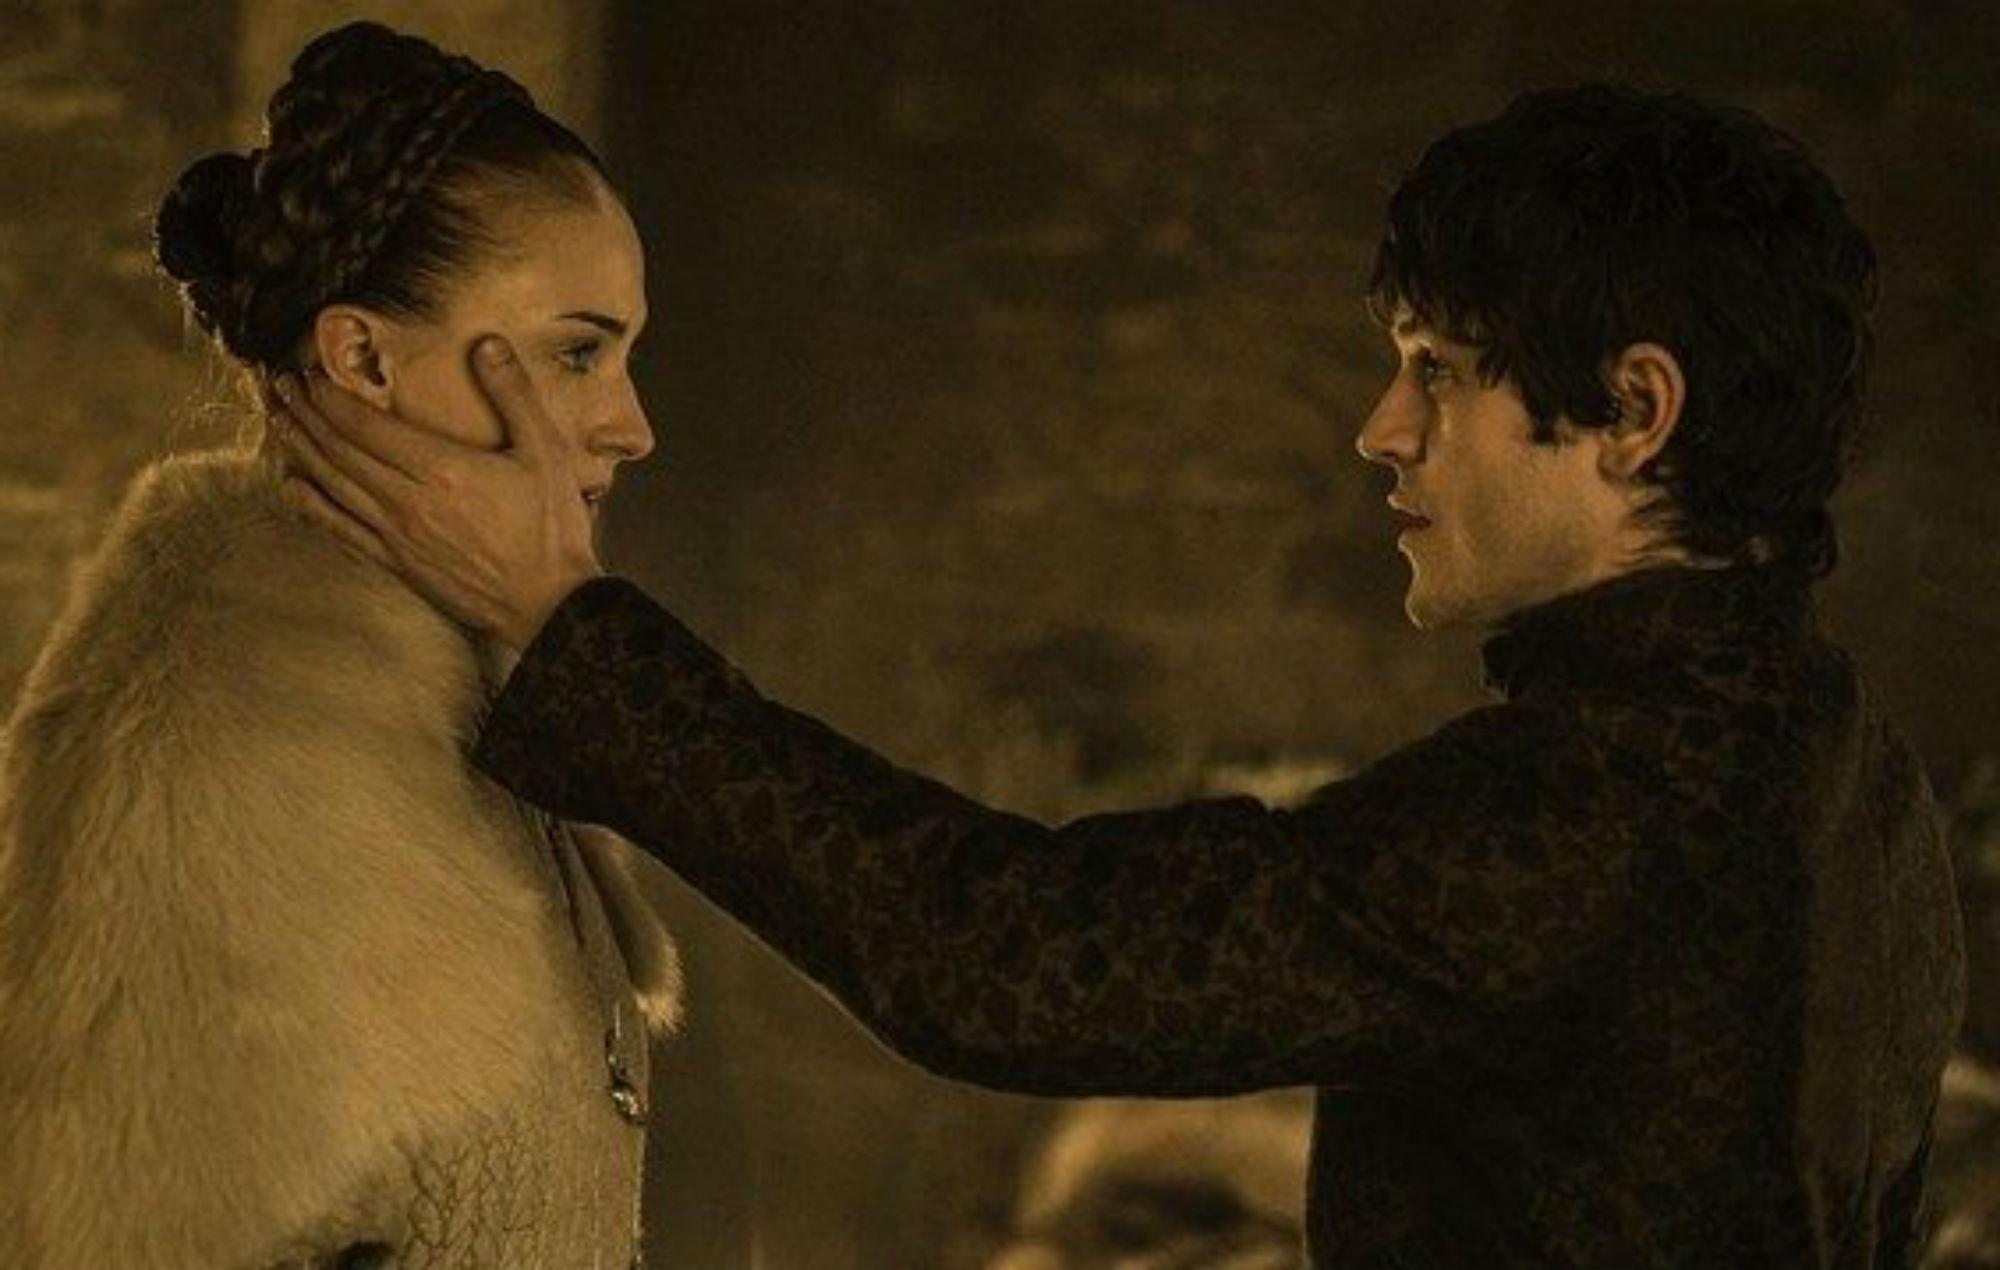 Iwan Rheon in 'Game Of Thrones'